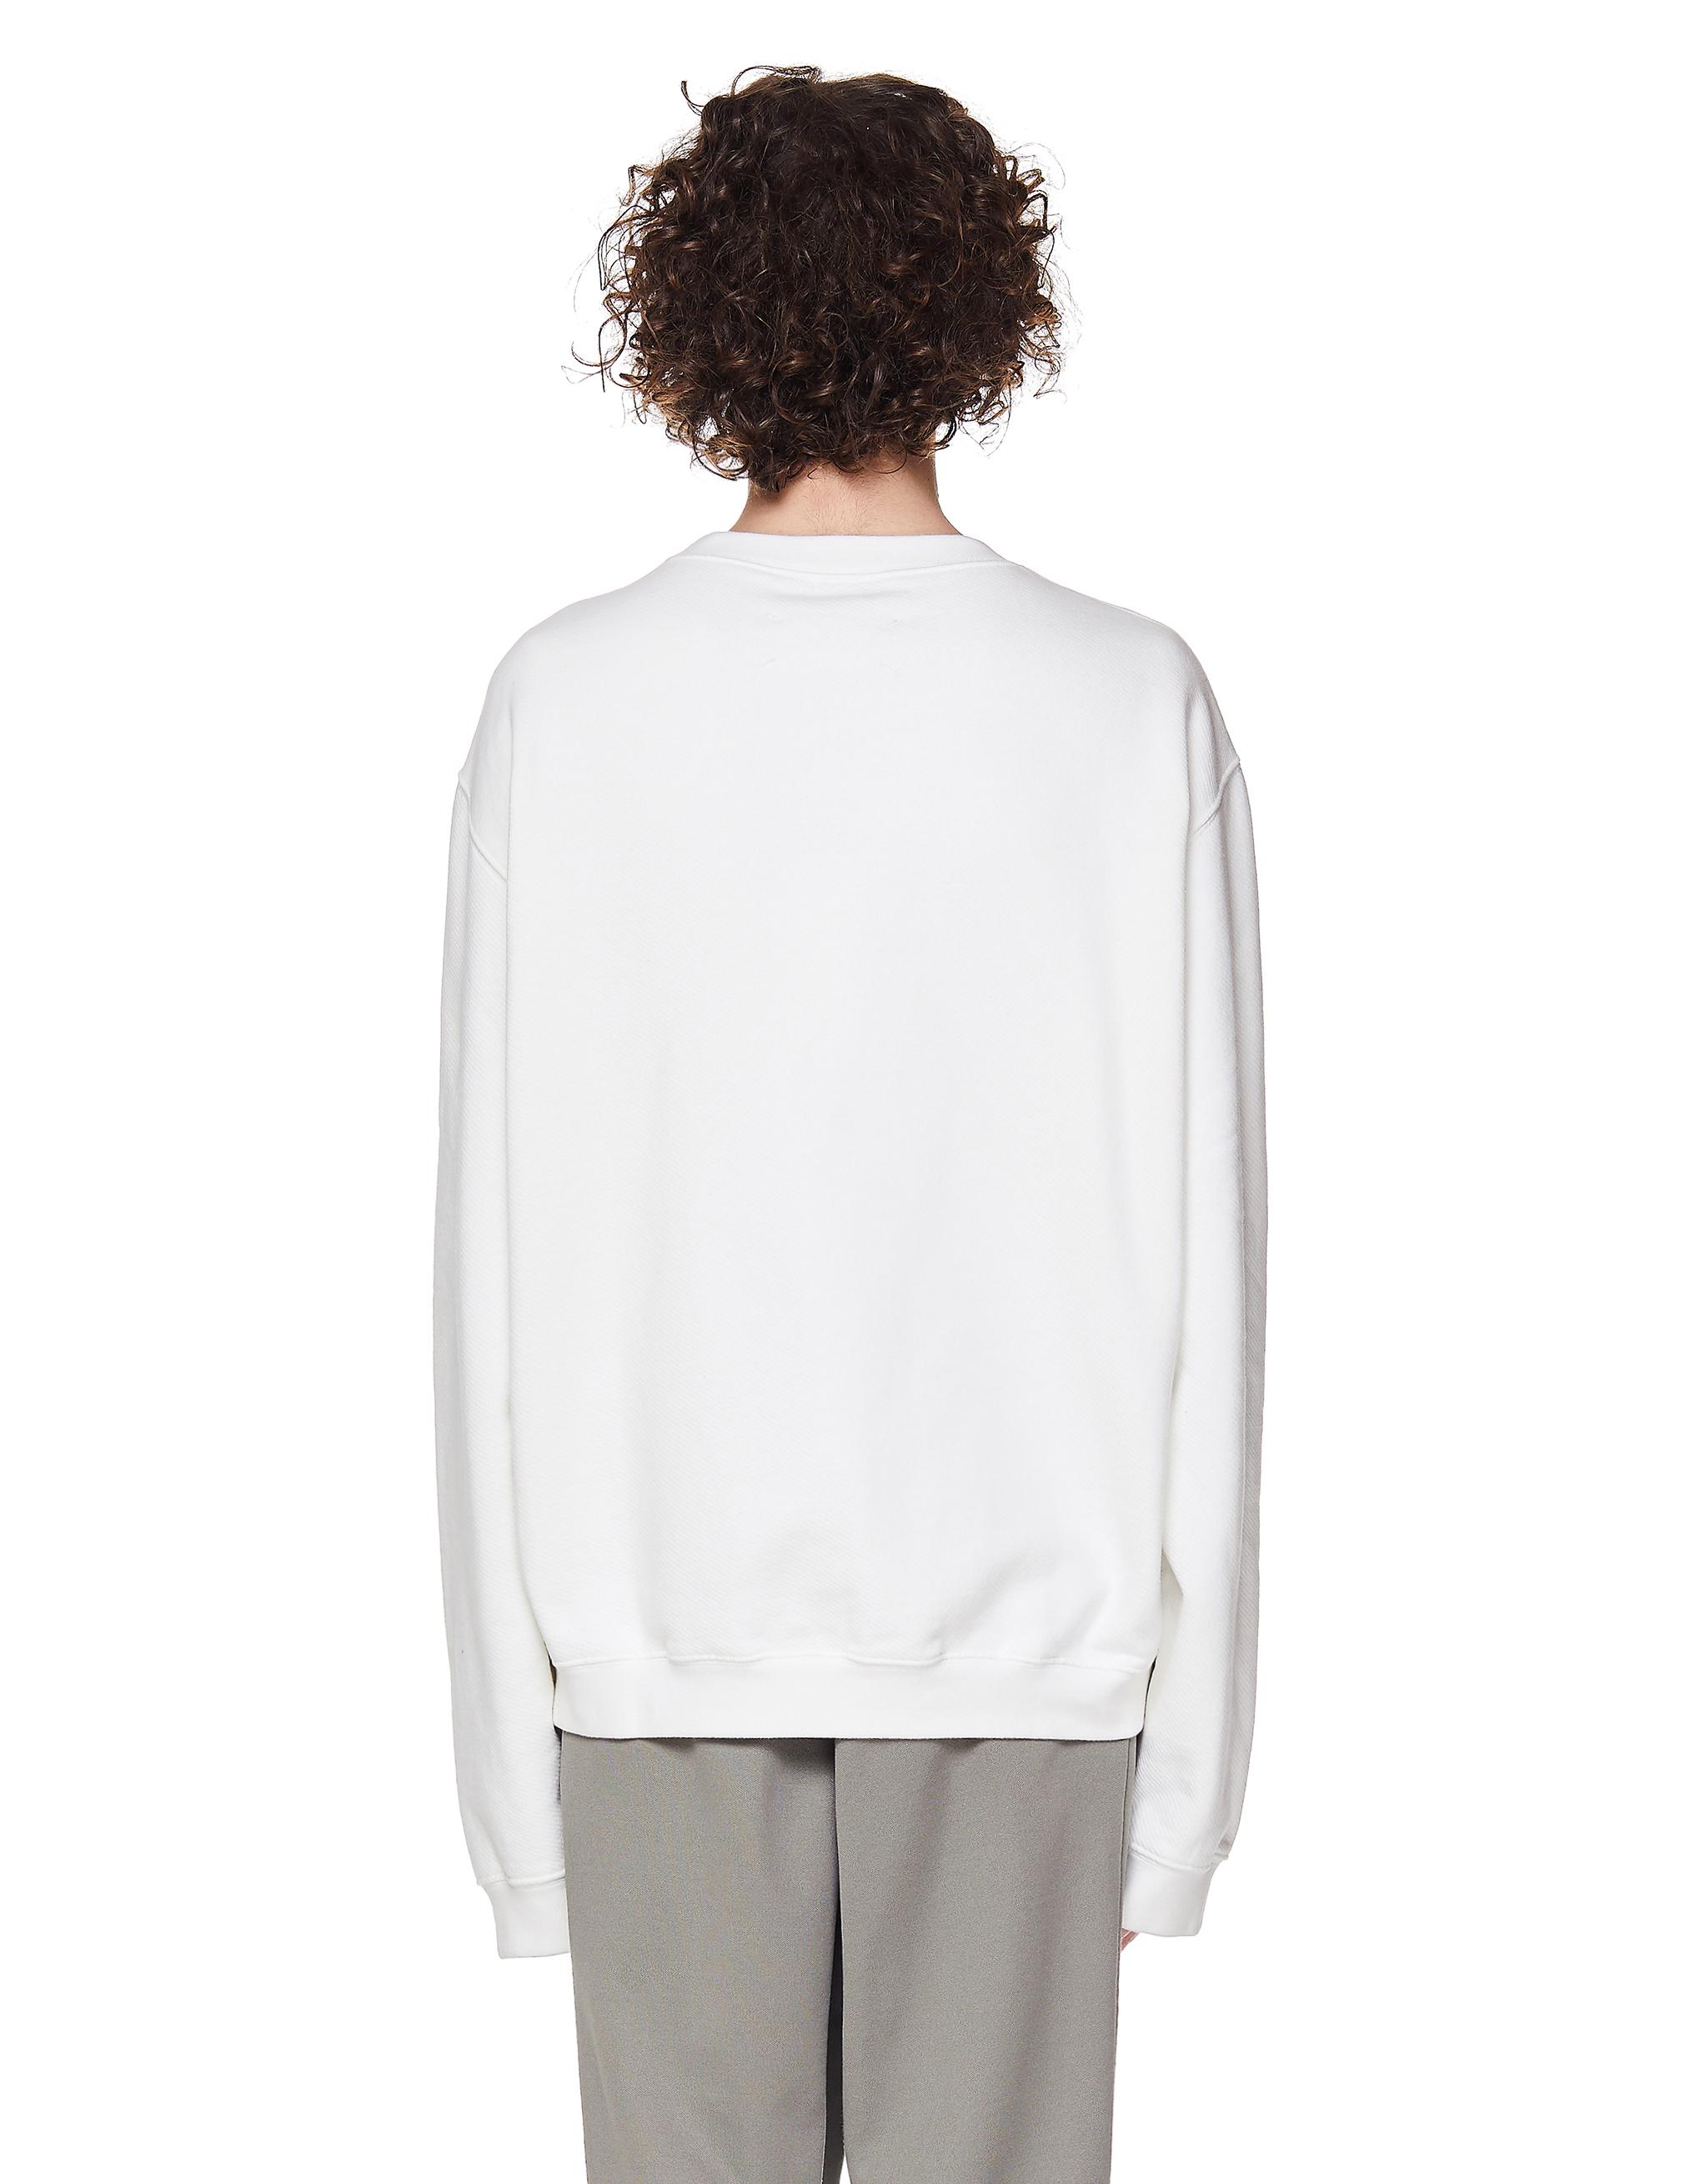 Maison Margiela White Cotton Sweatshirt